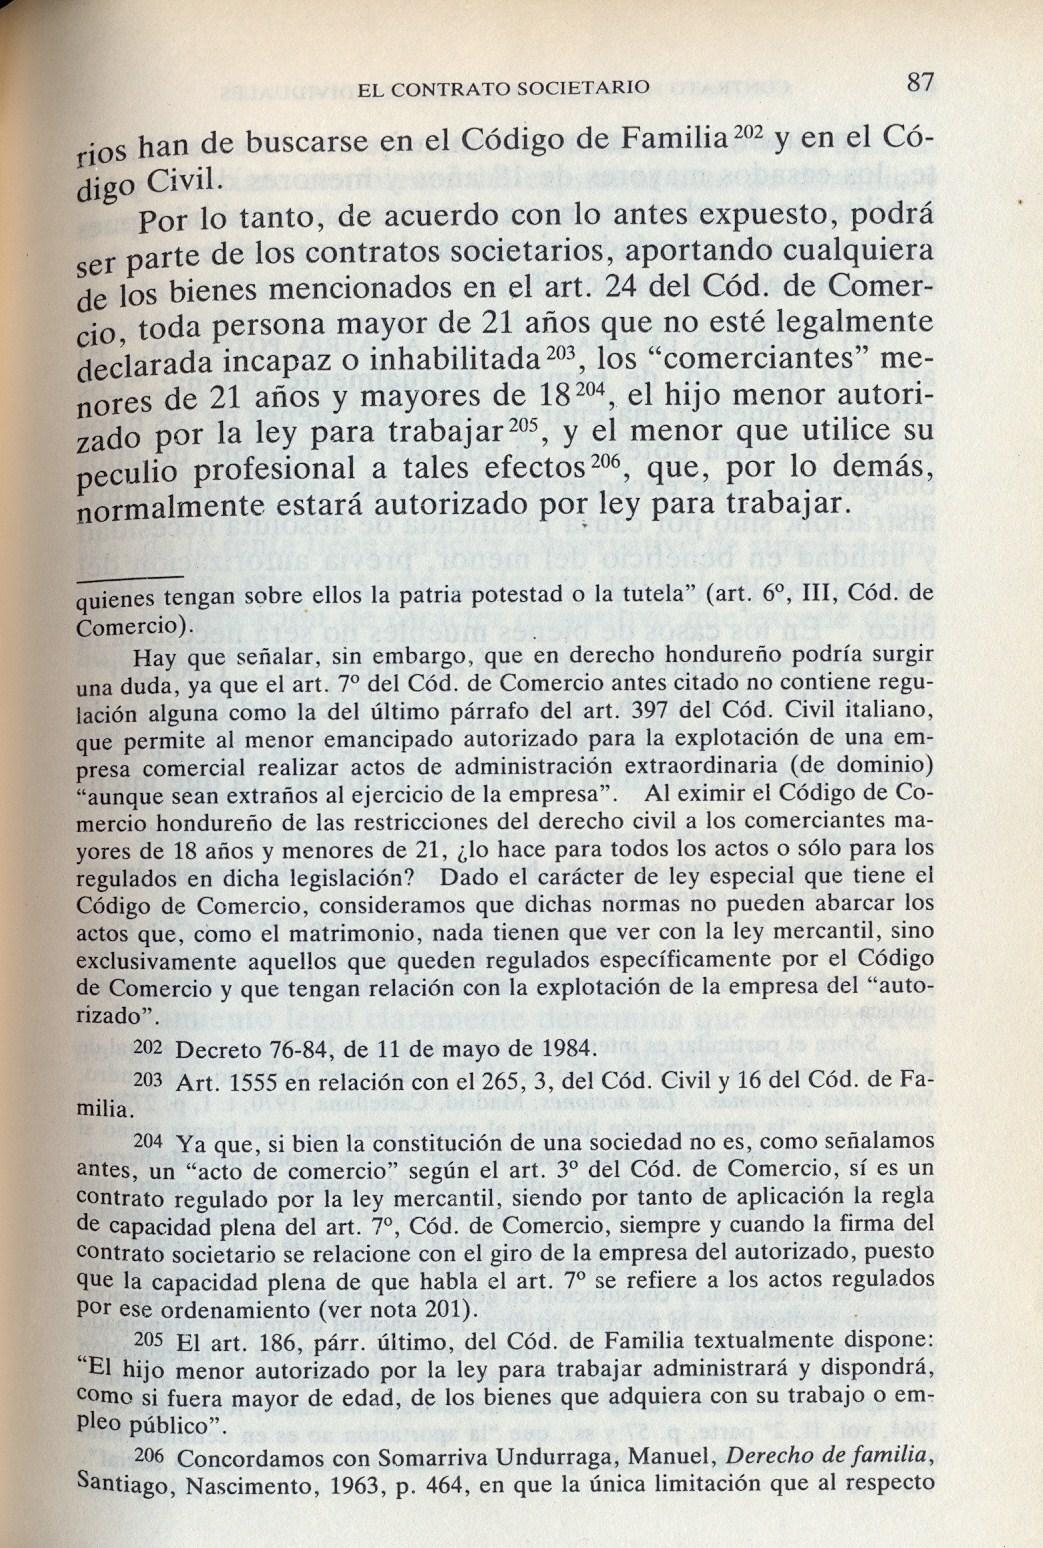 Pin Modelos De Contratos Alquiler Local Para Negocio Pelautscom on ...